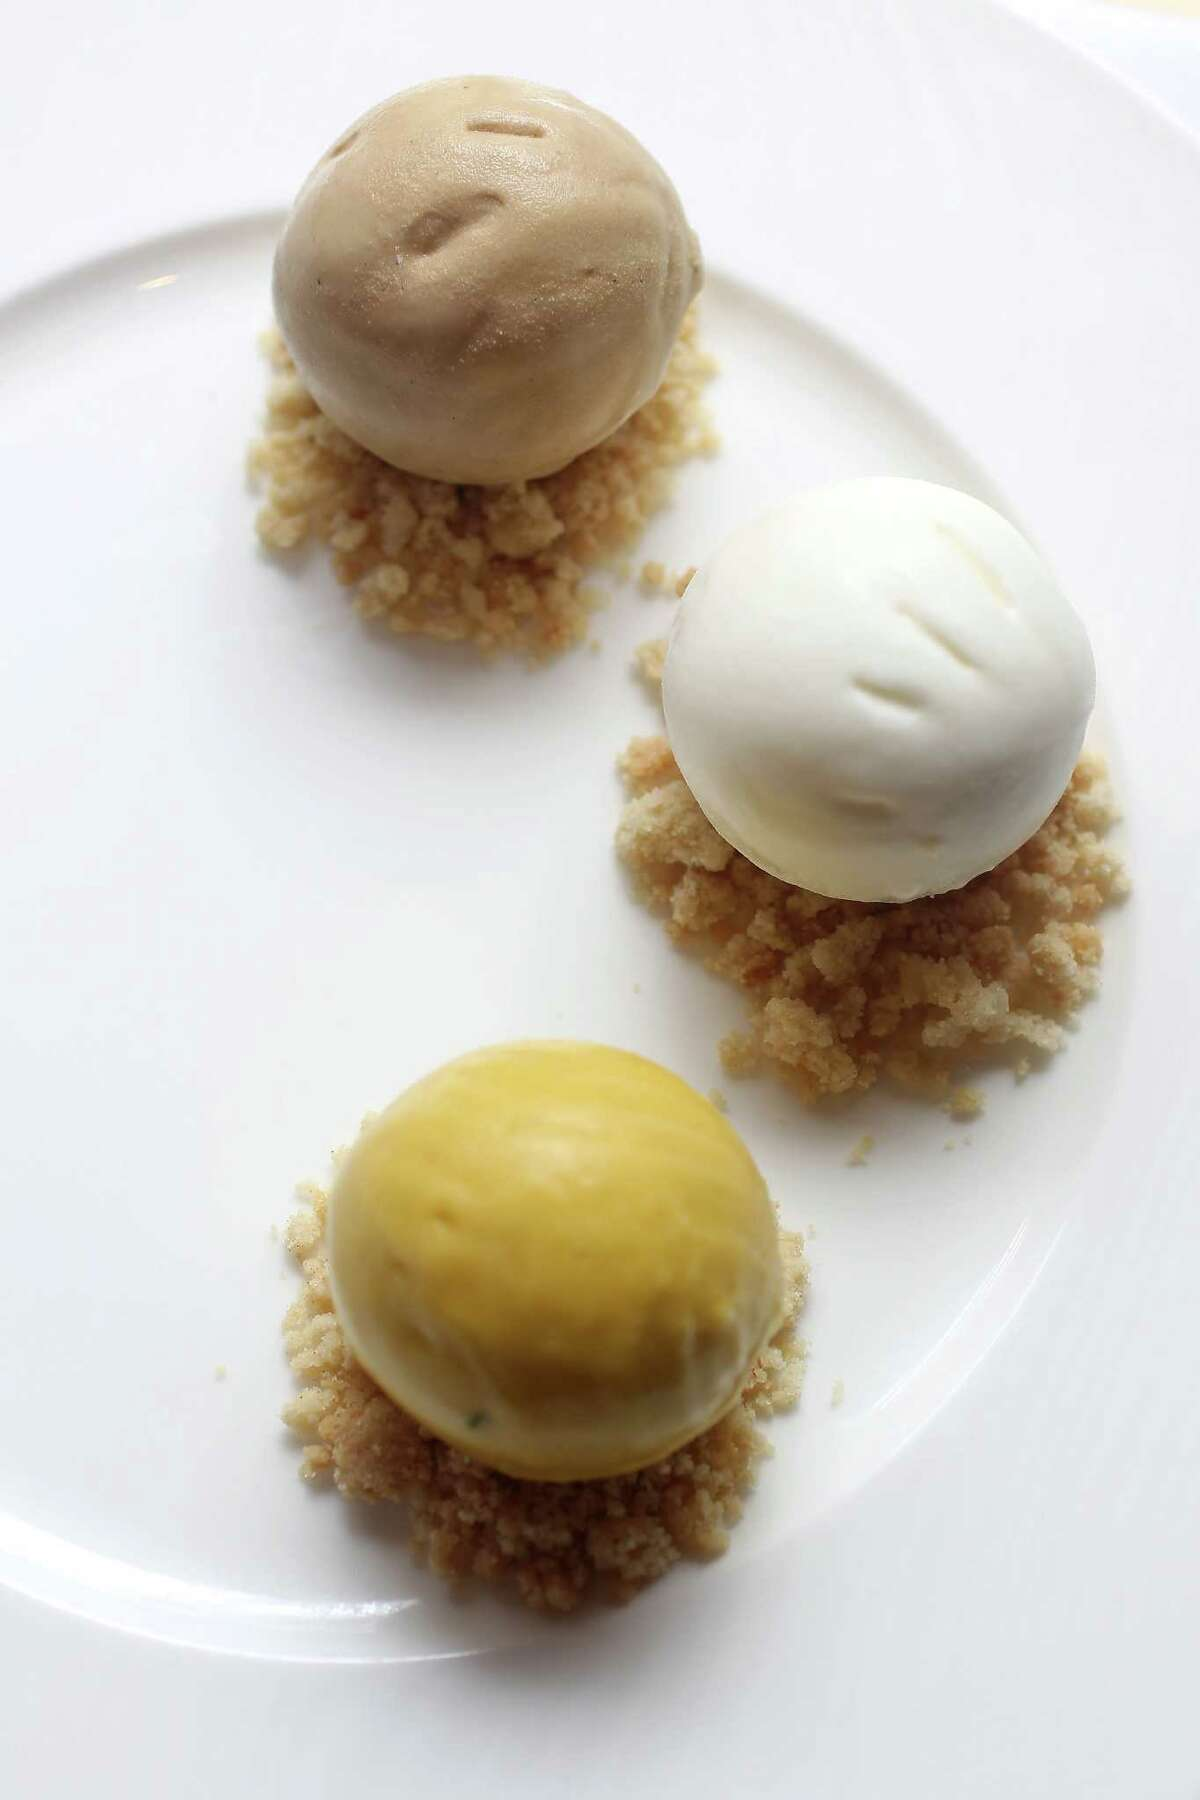 Cloud 10 Creamery's Chris Leung created ice cream flavors (top to bottom) Vietnamese coffee, sesame oil and mango/cilantro.